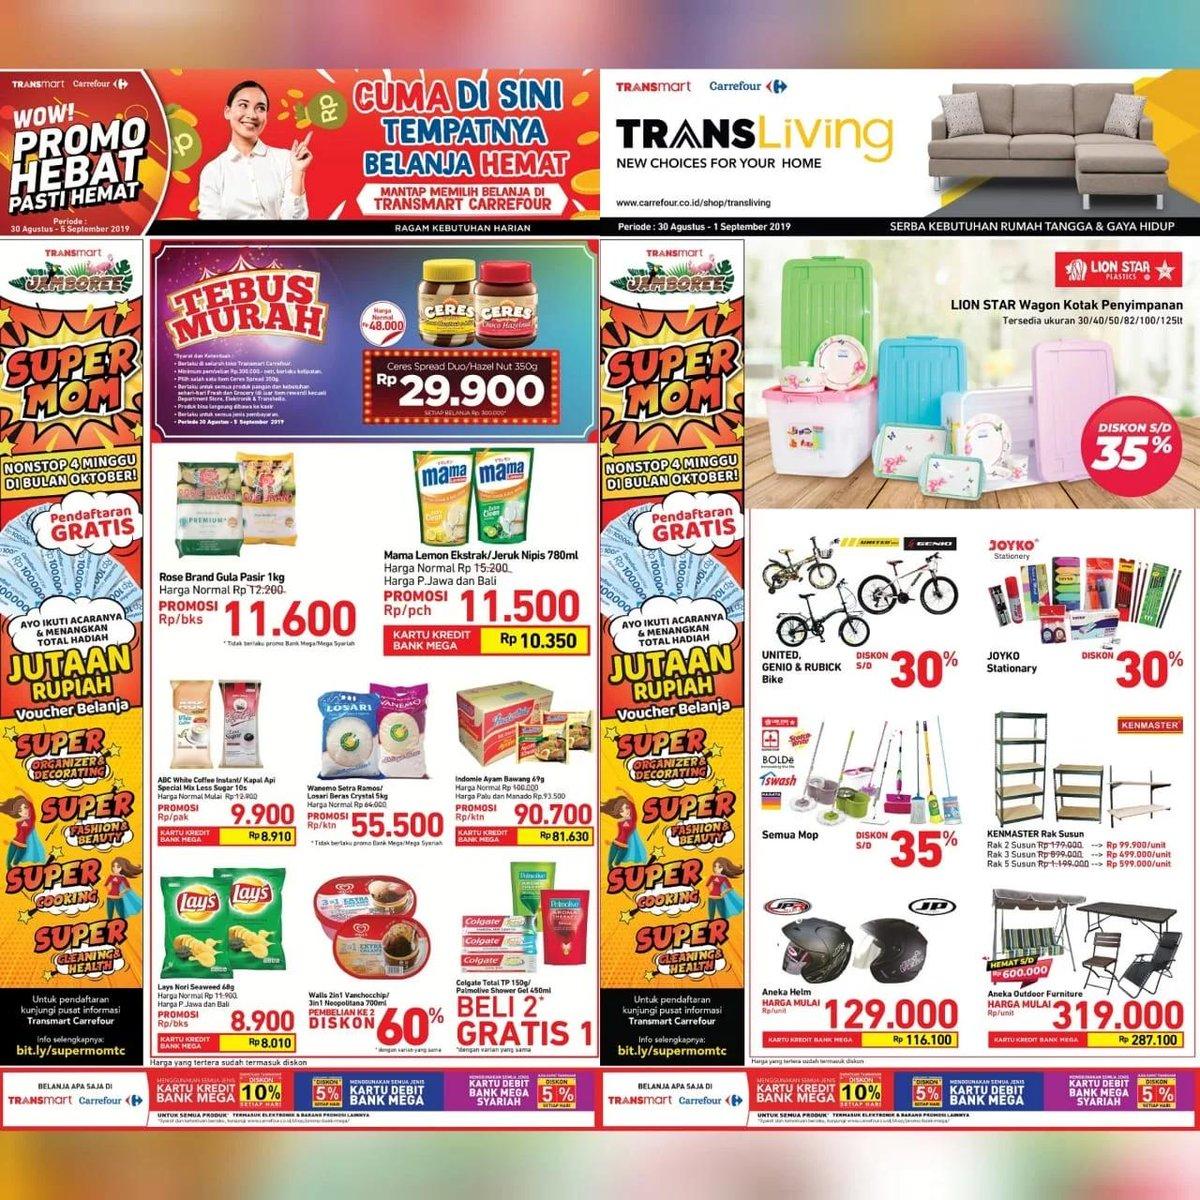 À¦Ÿ À¦‡à¦Ÿ À¦° Giladiskon Indonesia Katalog Promo Jsm Carrefour Supermarket Periode 30 Agustus 5 September 2019 Https T Co Zjjahv3zpg Carrefour Promocarrefour Katalogcarrefour Jsm Promojsm Katalogjsm Giladiskon Katalogpromo